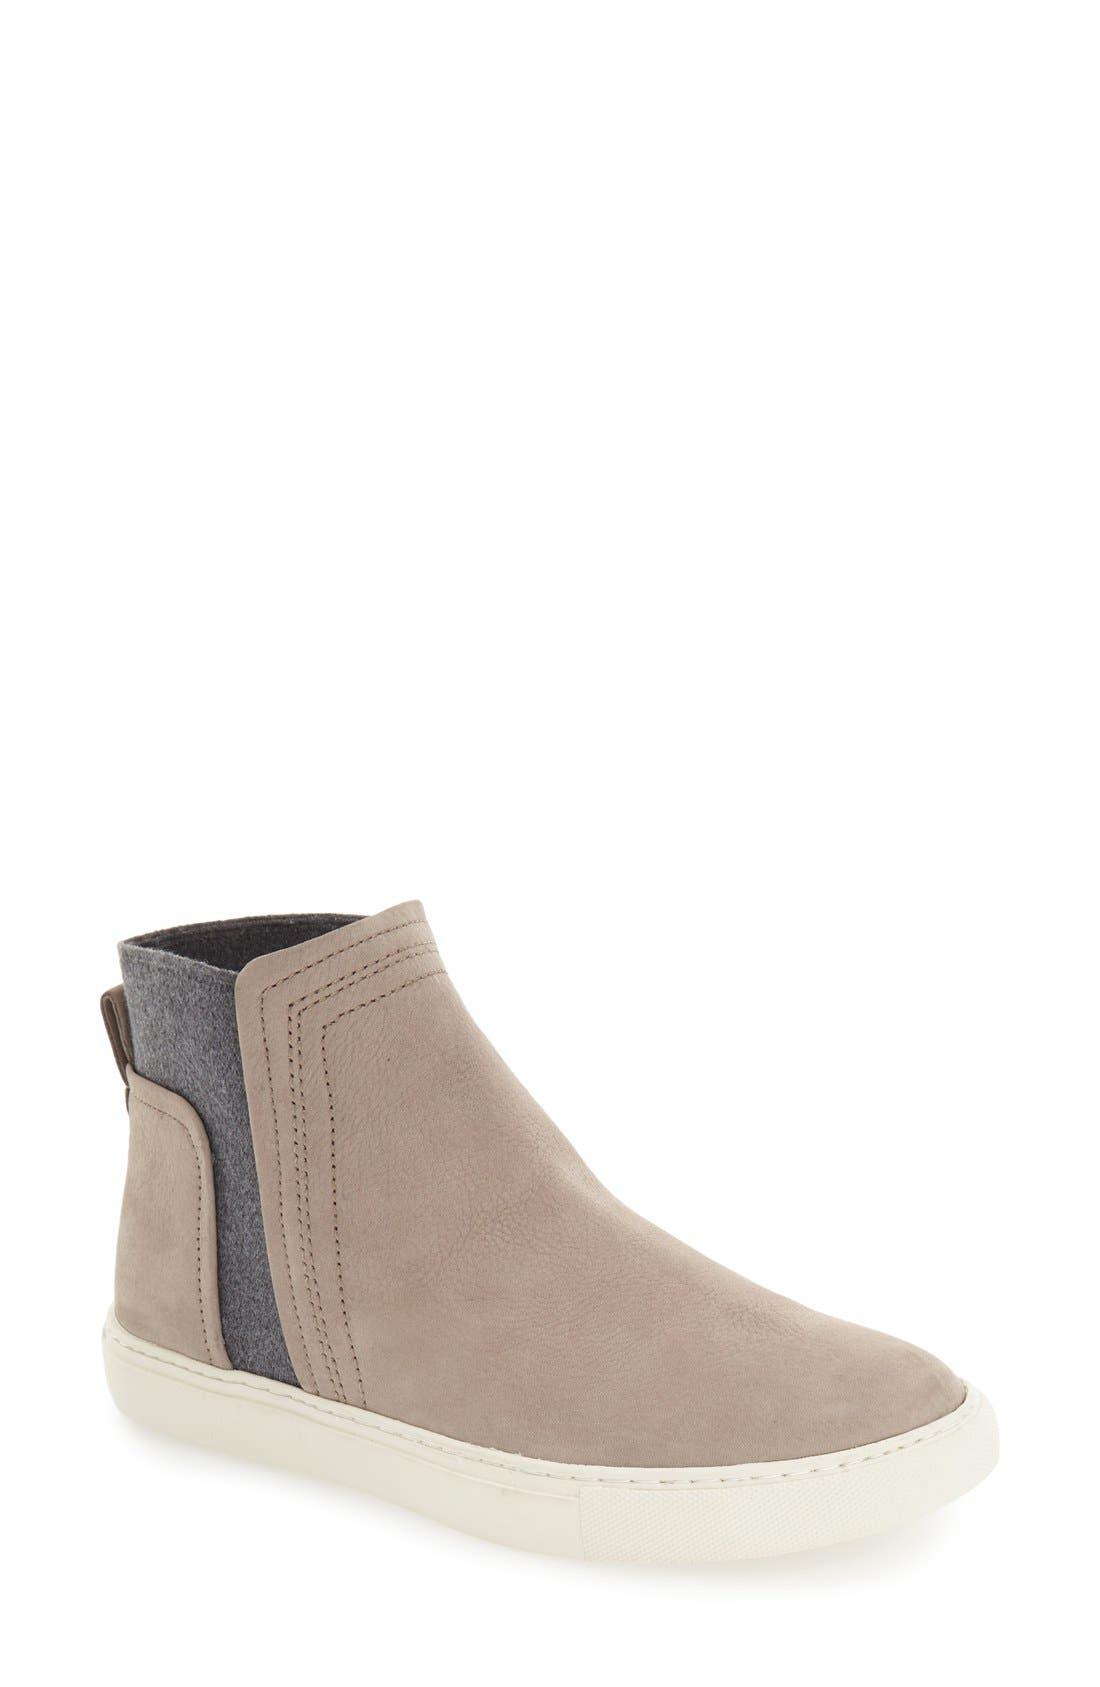 Alternate Image 1 Selected - Kenneth Cole New York 'Ken' Leather Slip-On Sneaker (Women)